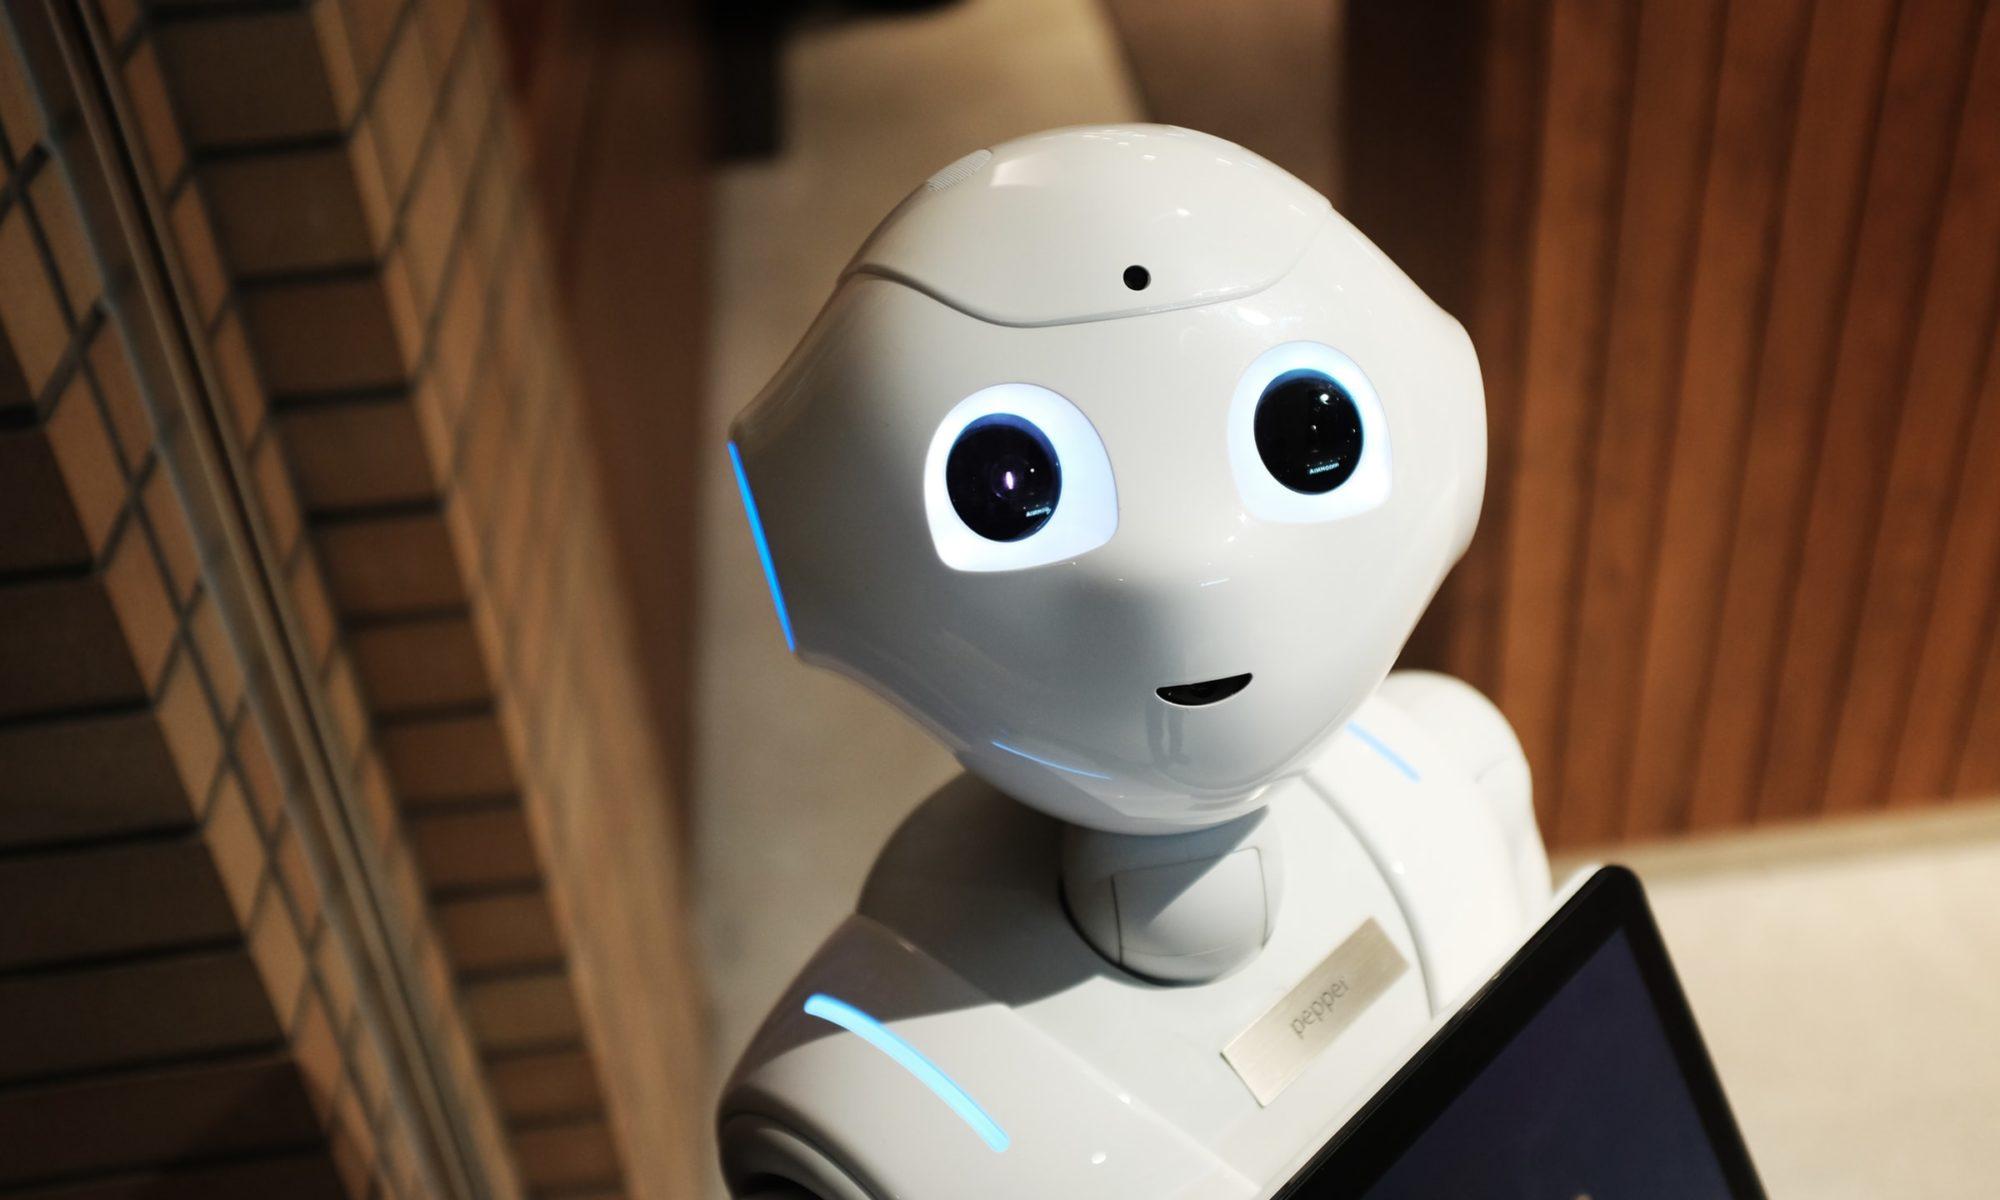 A friendly robot